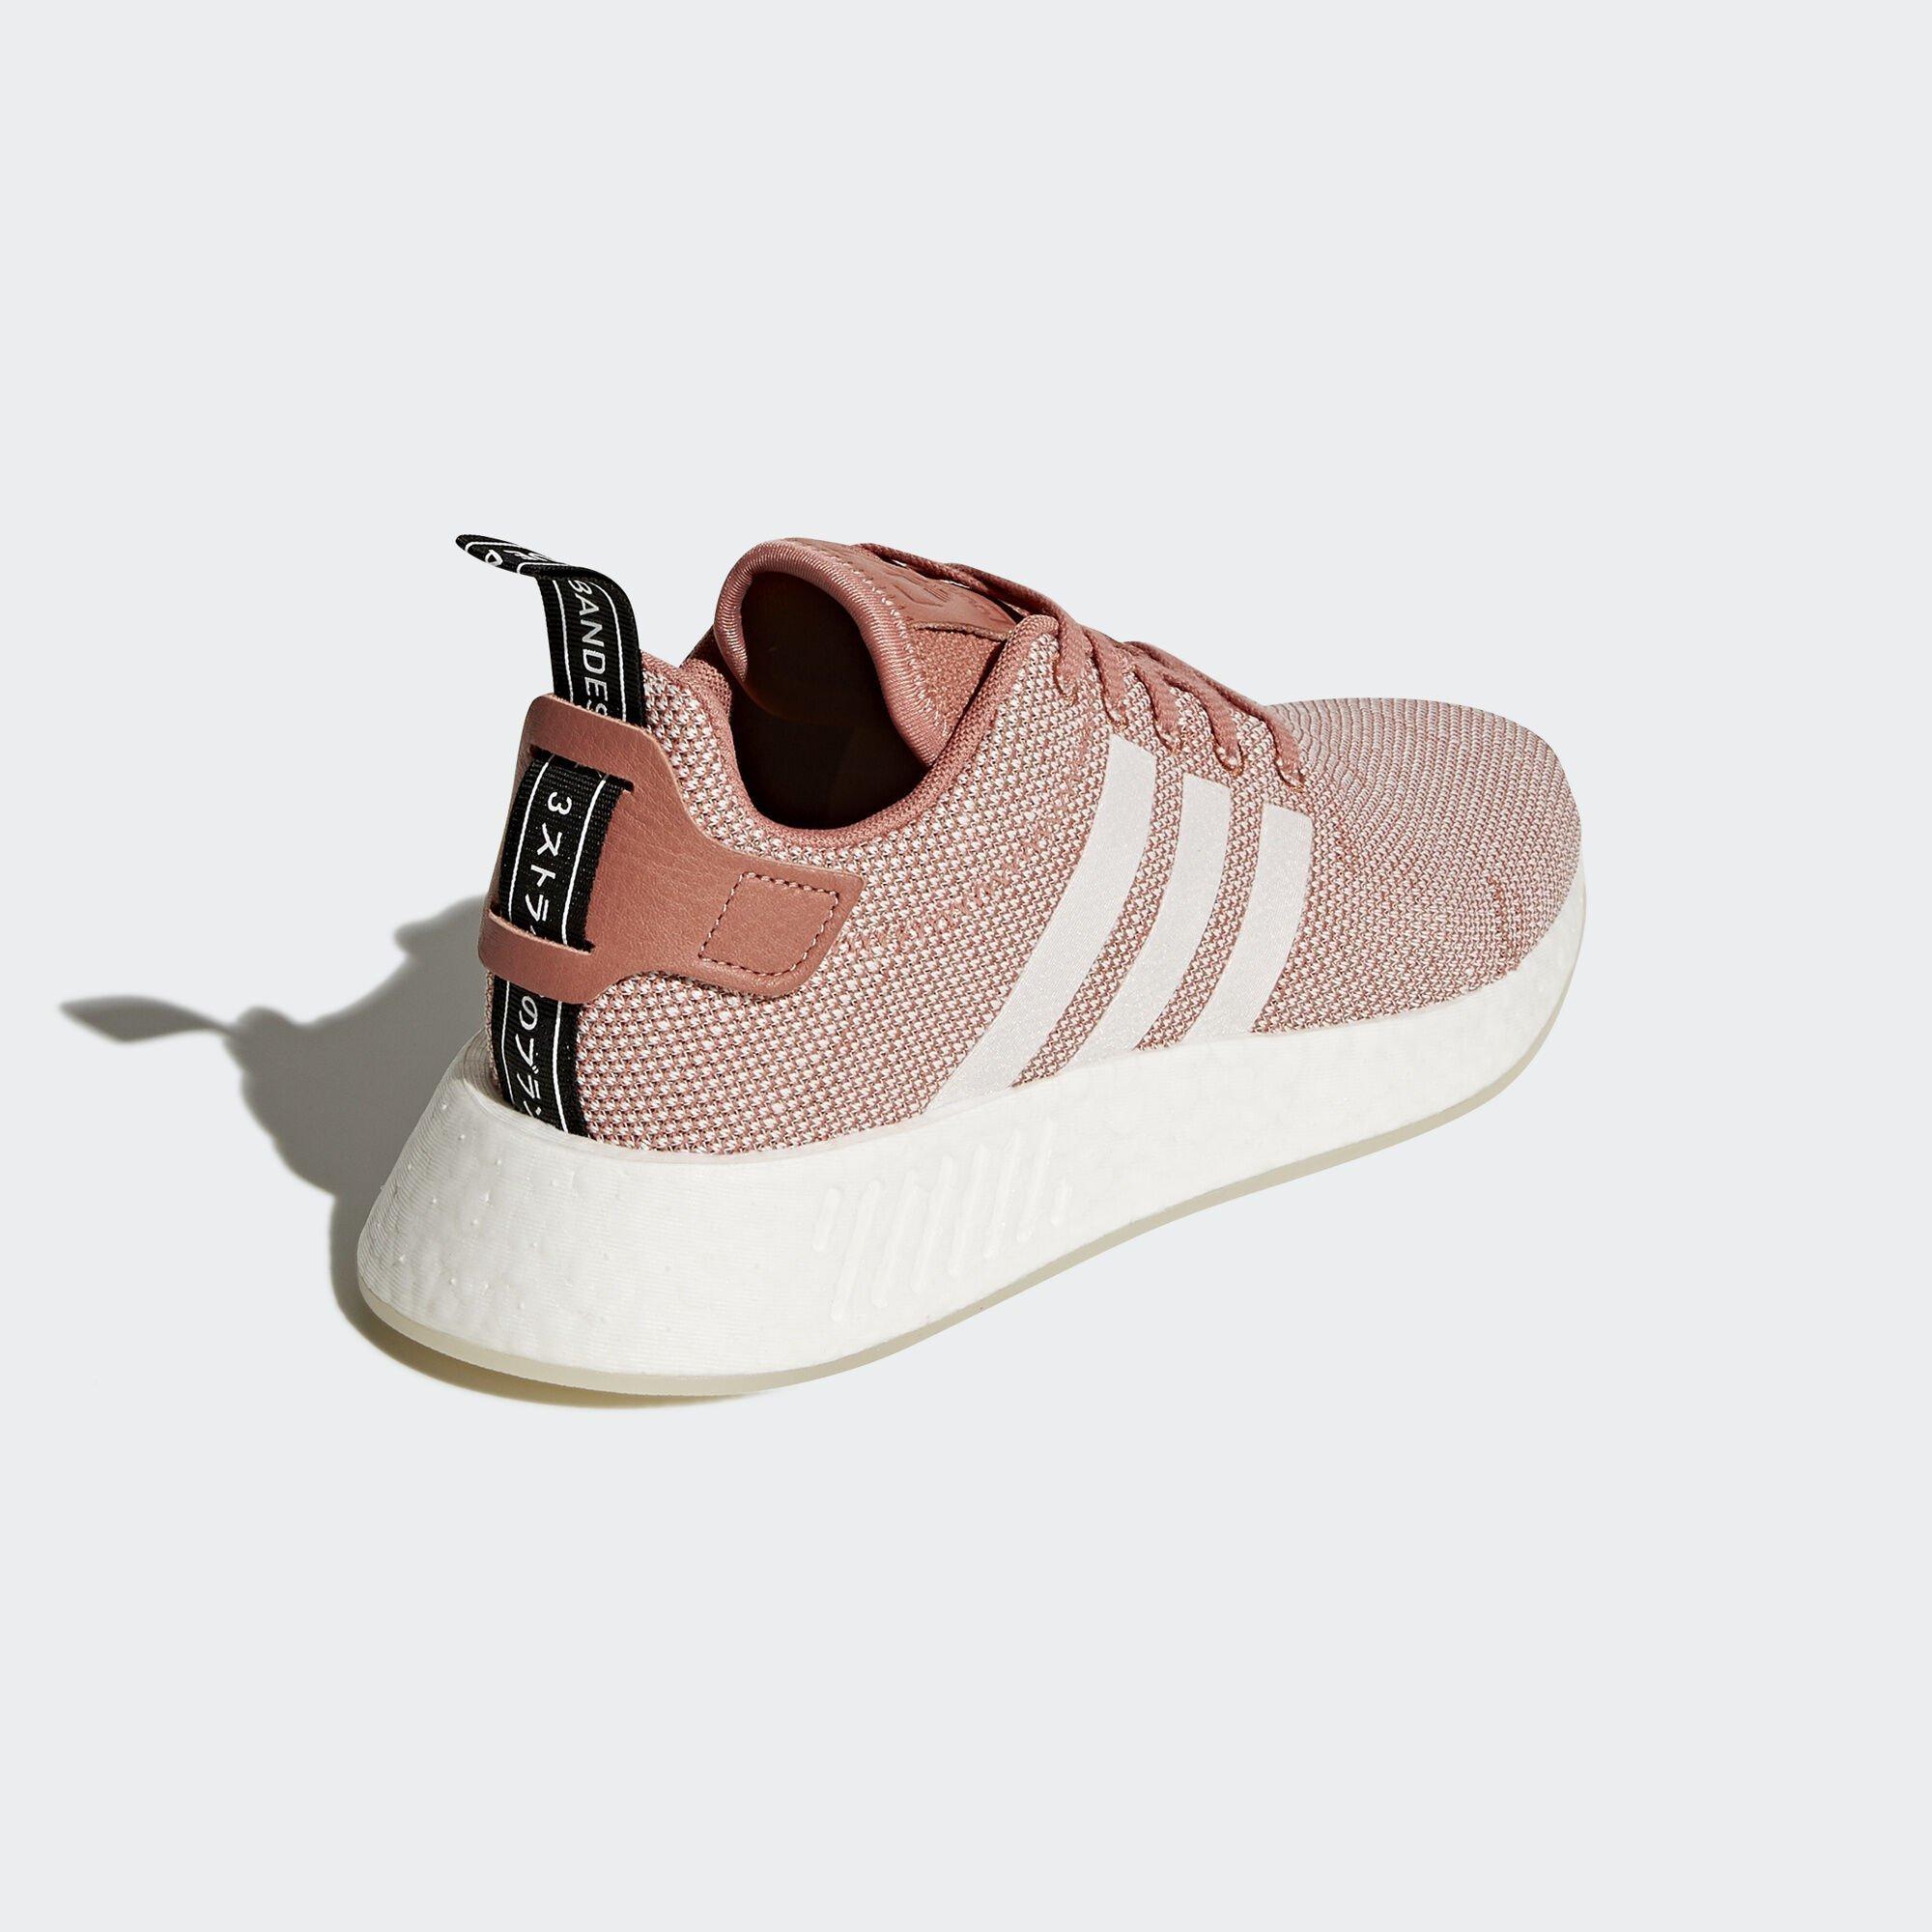 adidas NMD R2 Ash Pink (W) (CQ2007)